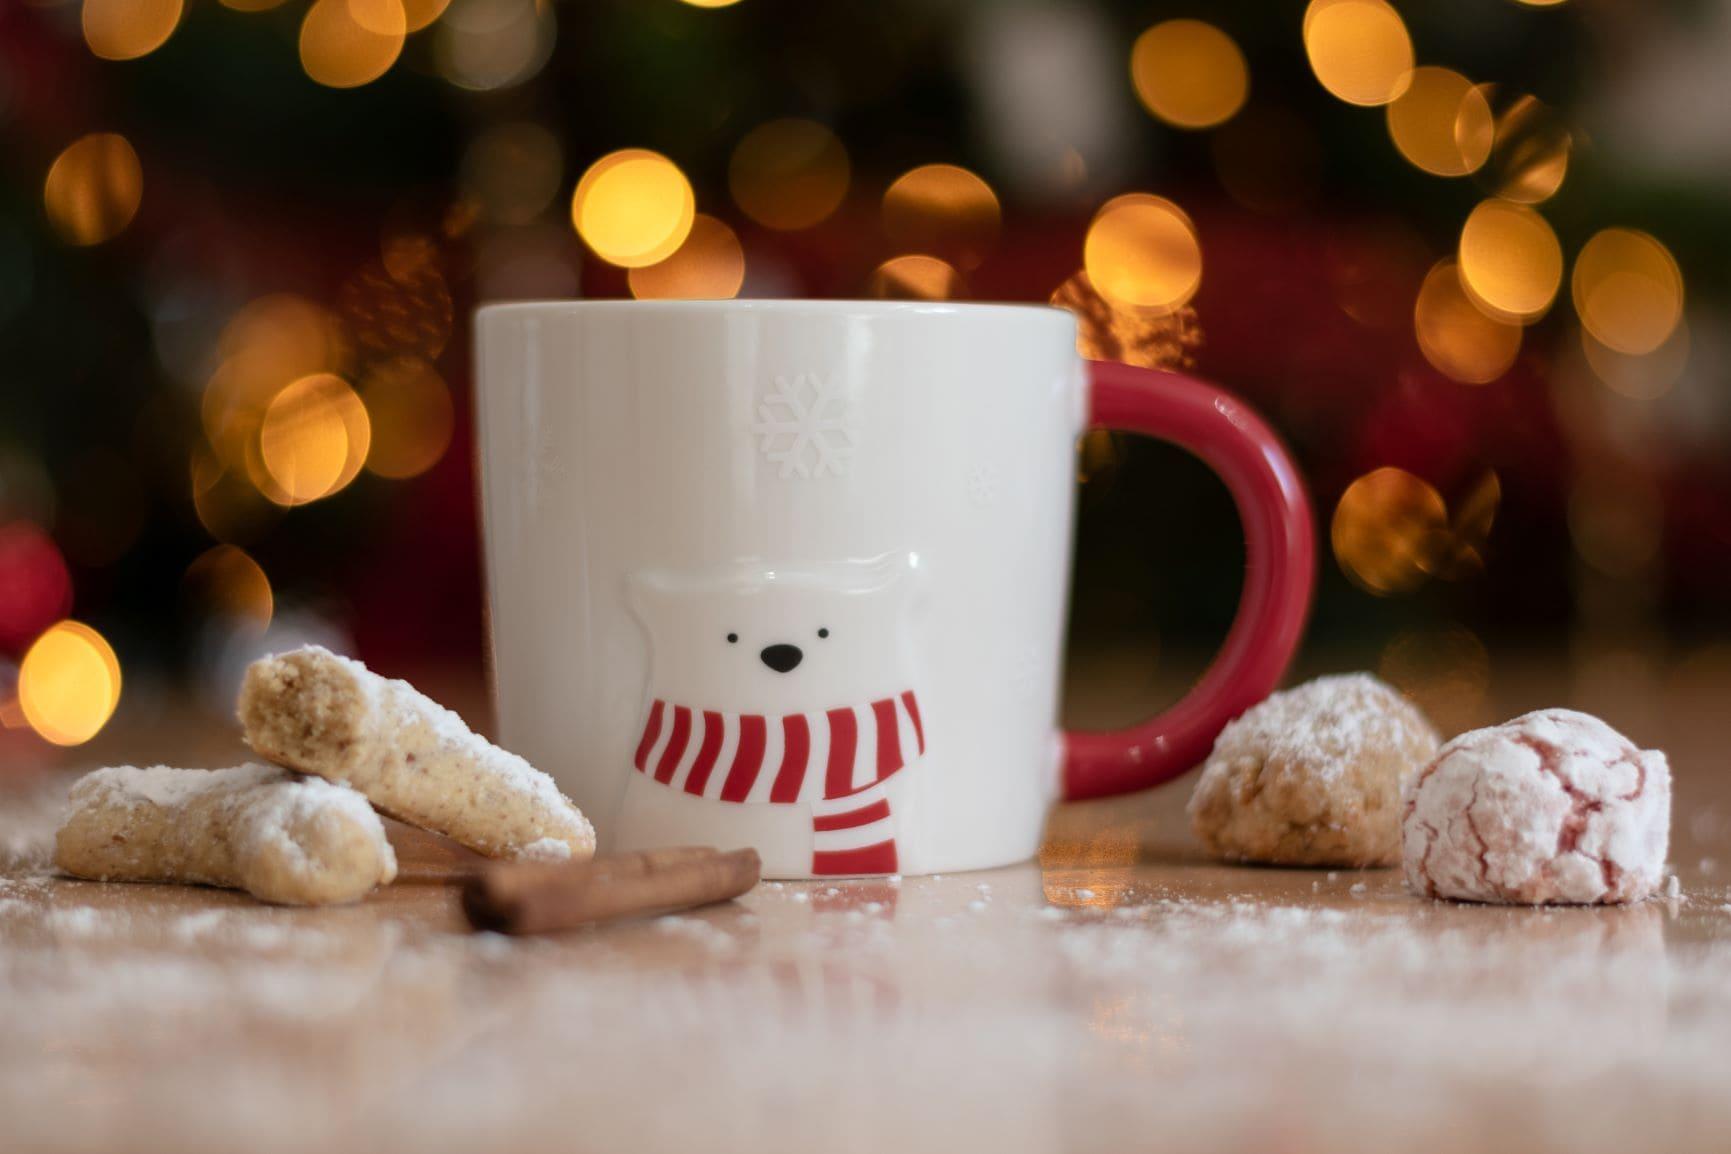 Christmas food excess - do you stockpile like we're going to war?